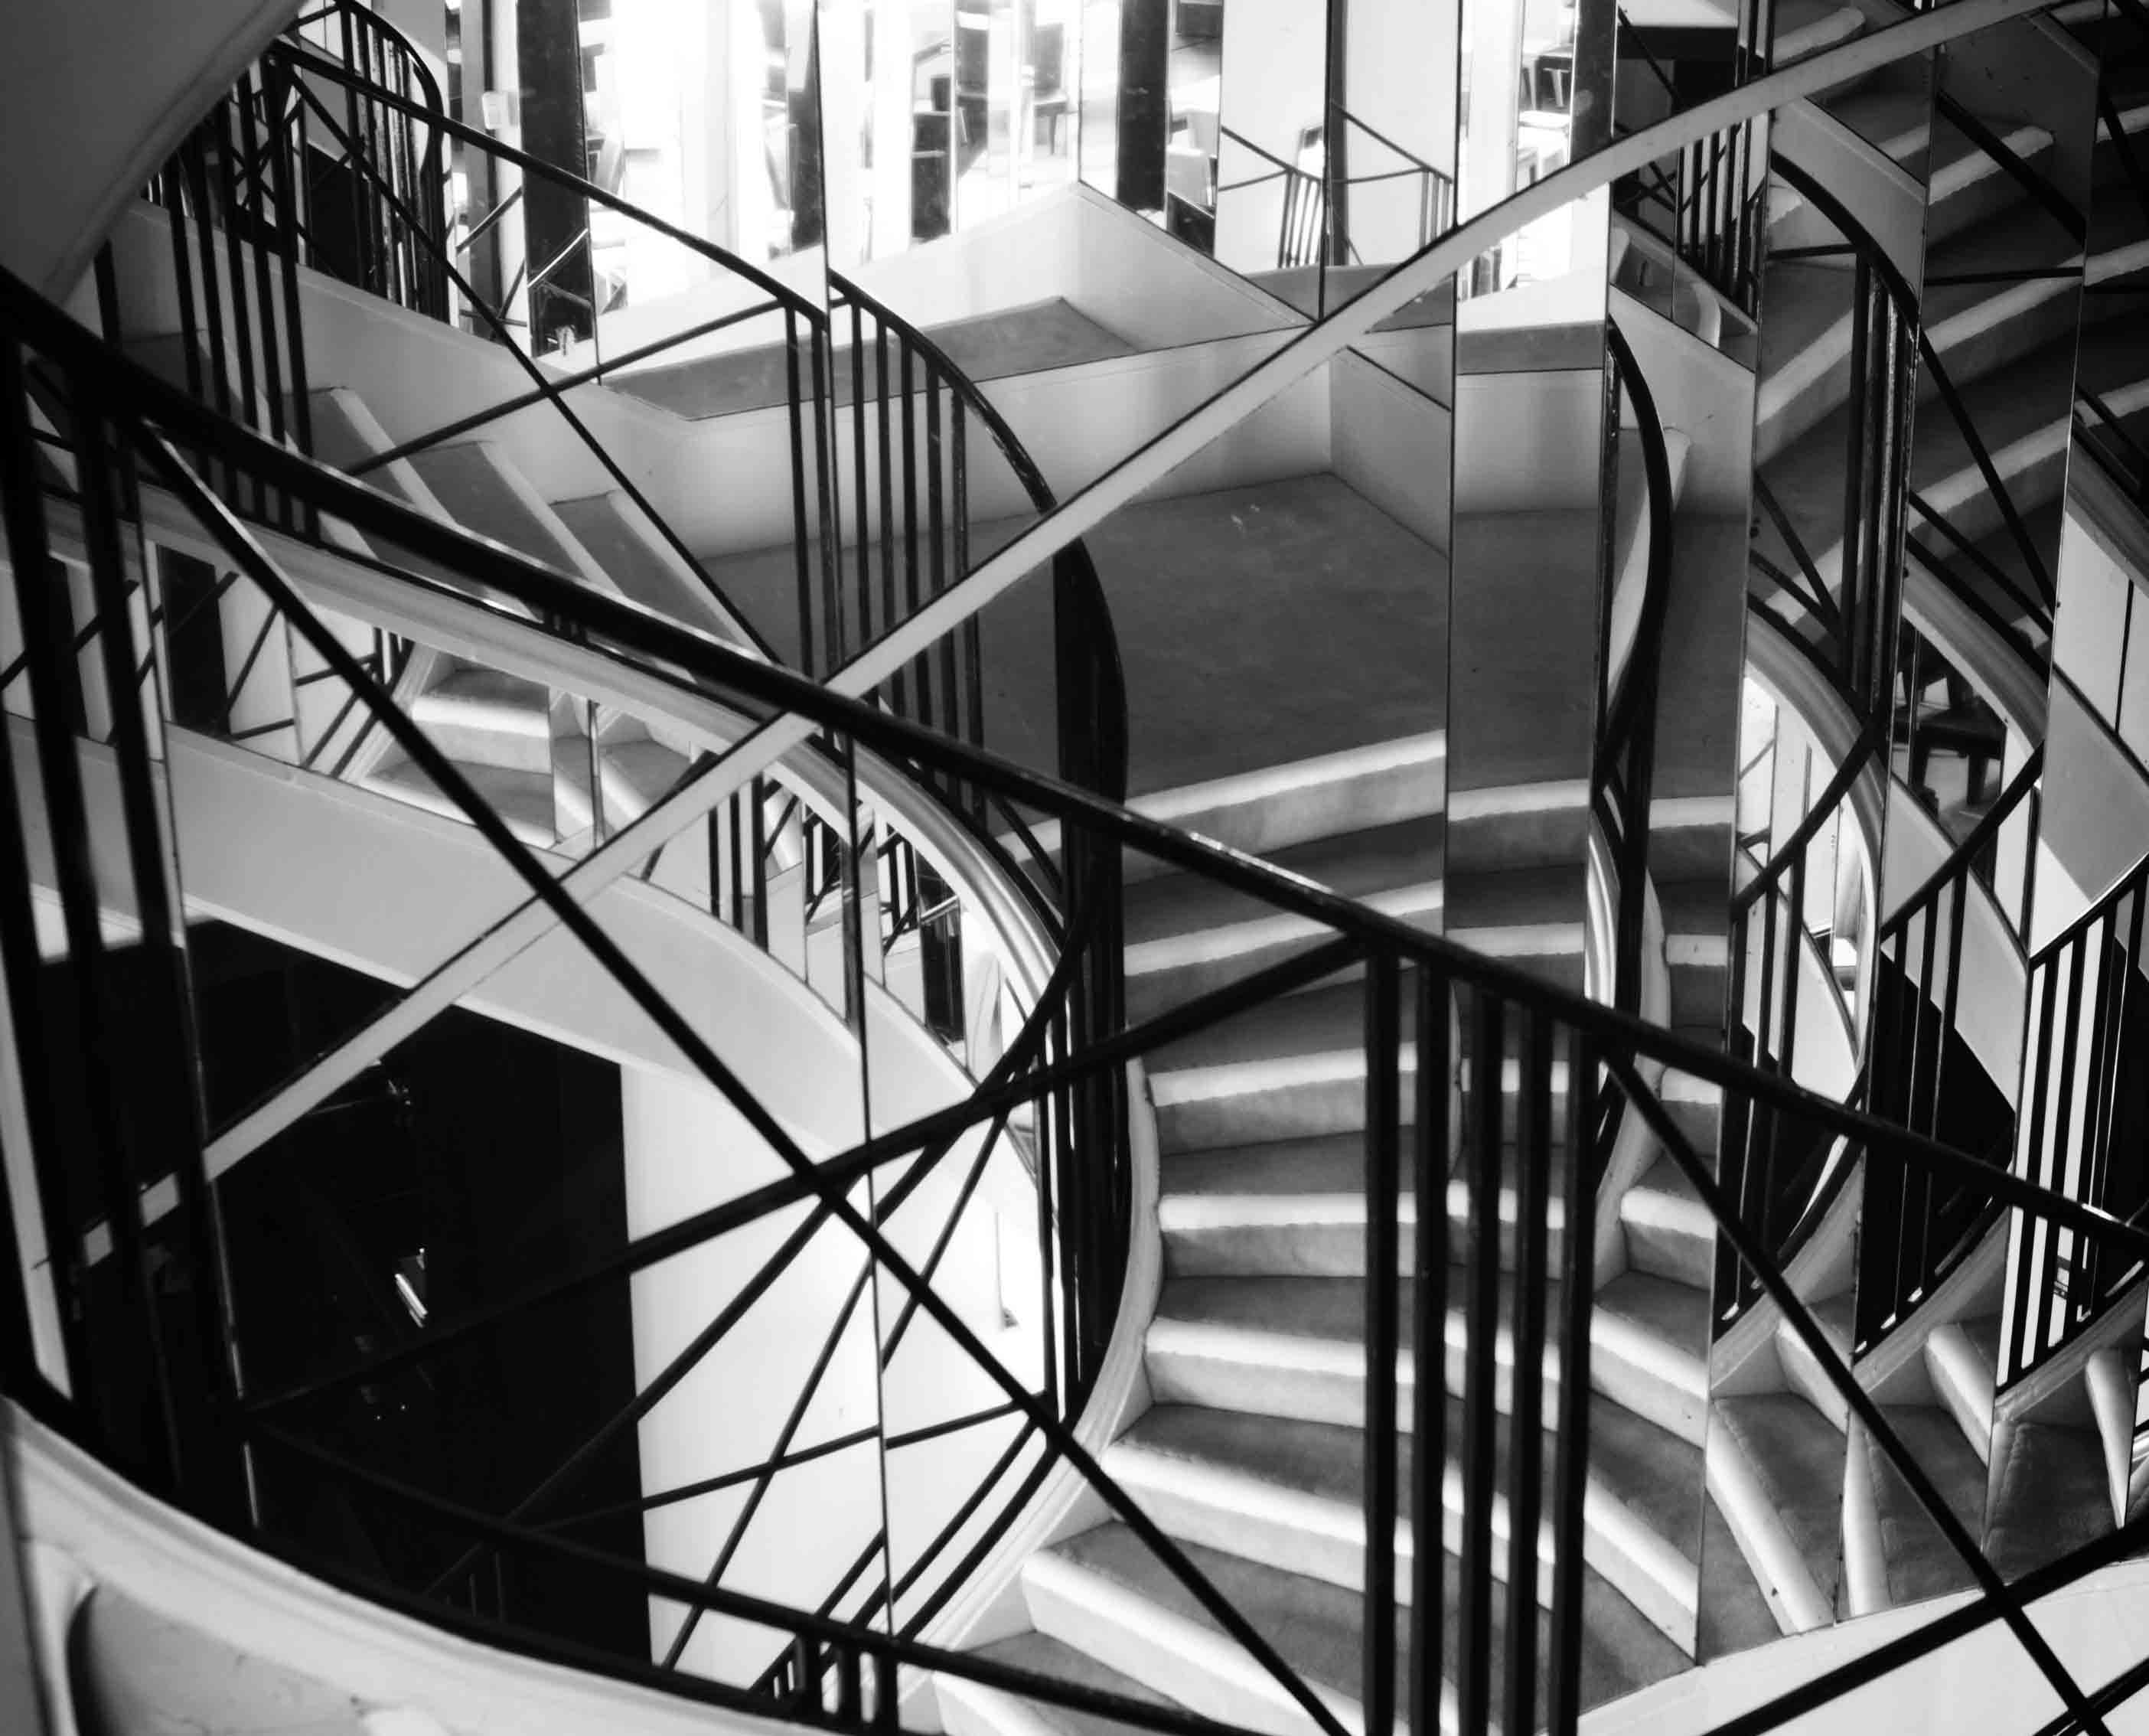 Second Floor by Sam Taylor-Johnson